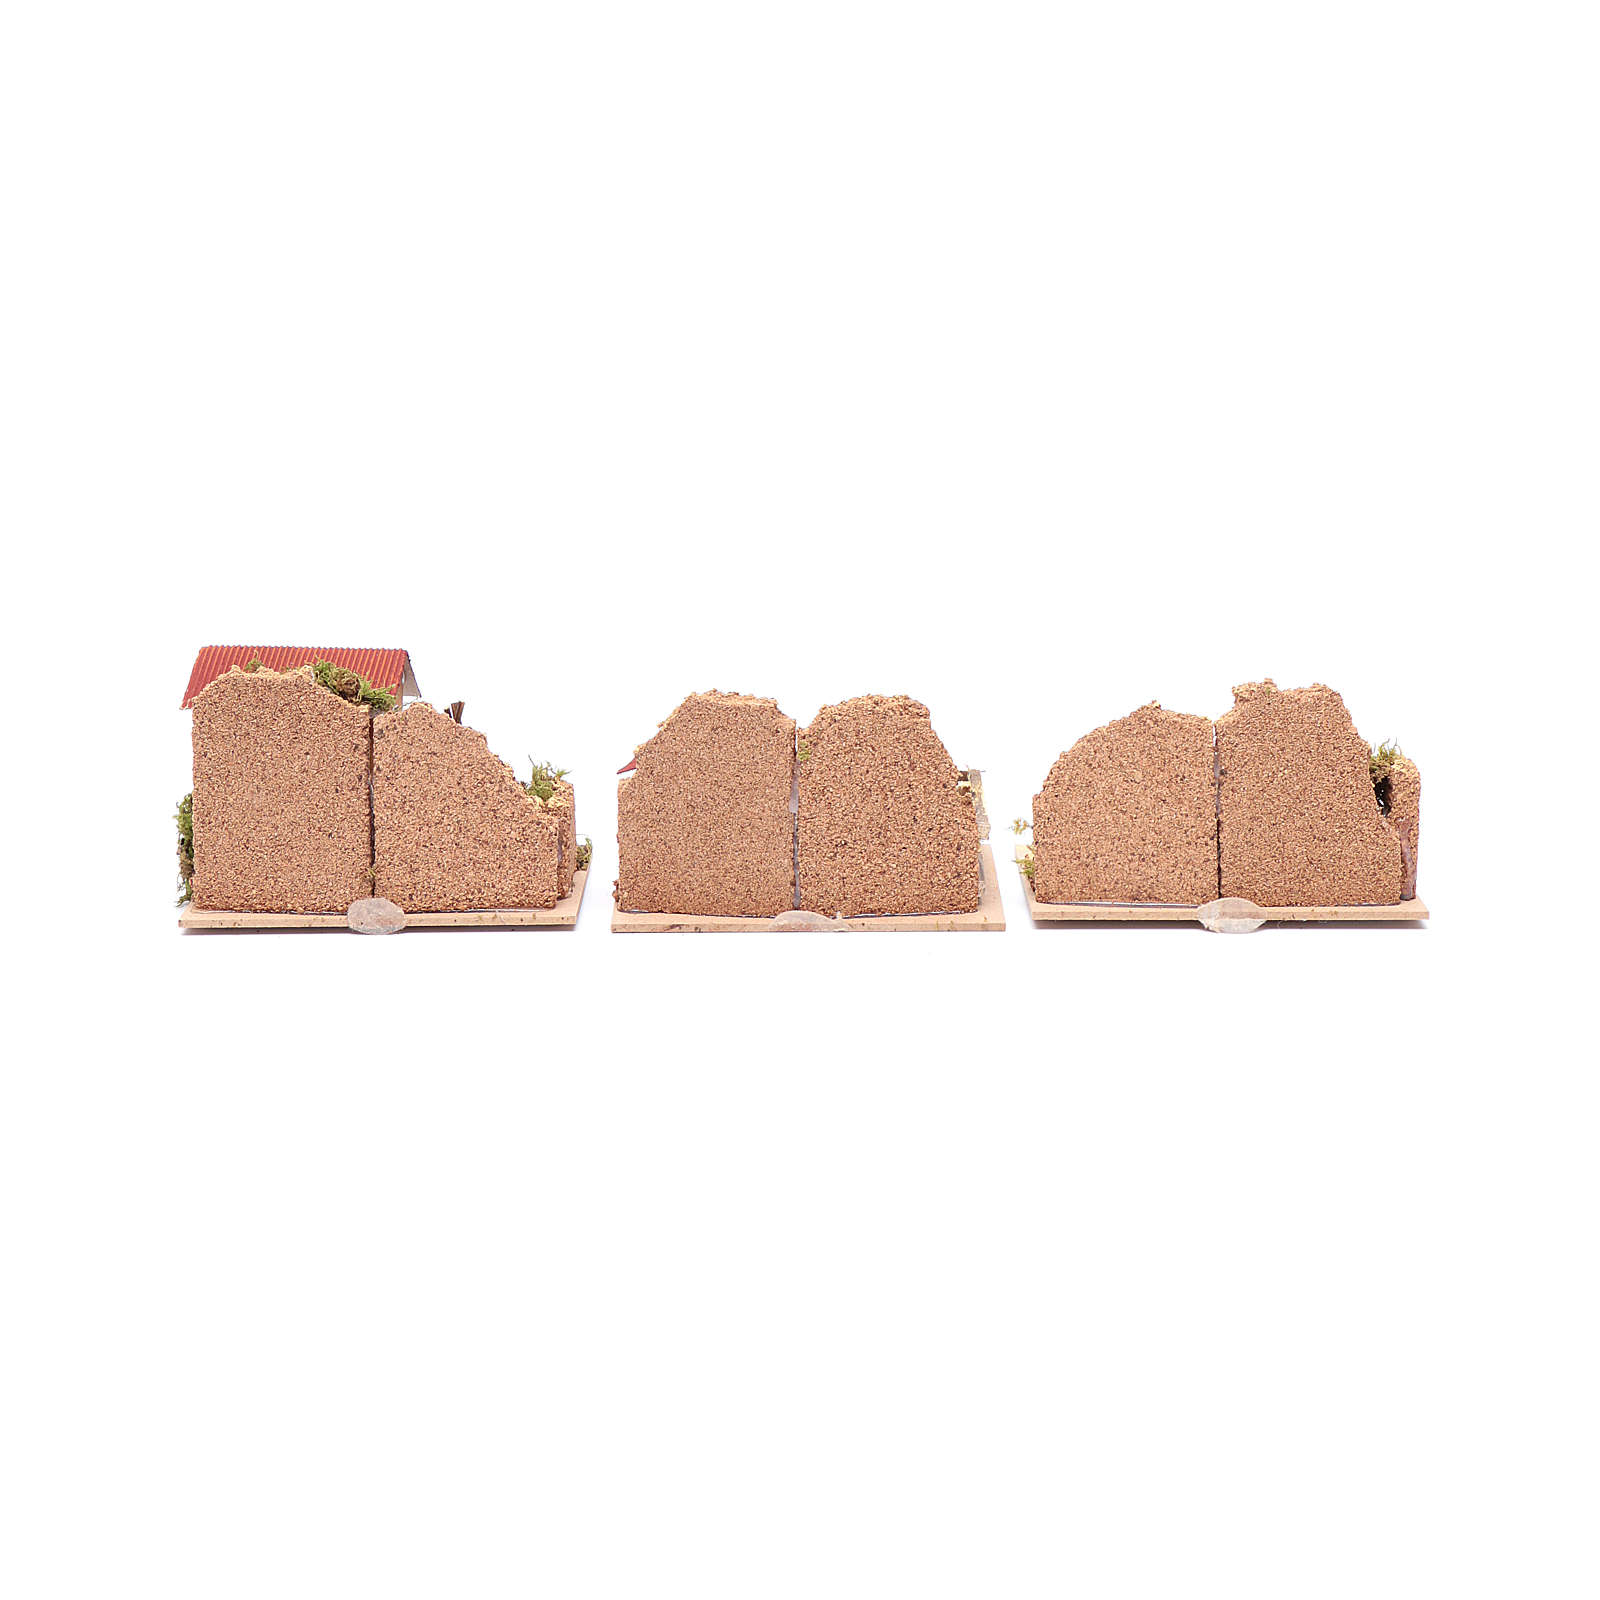 Set 6 pezzi case 15x10x10 cm 4